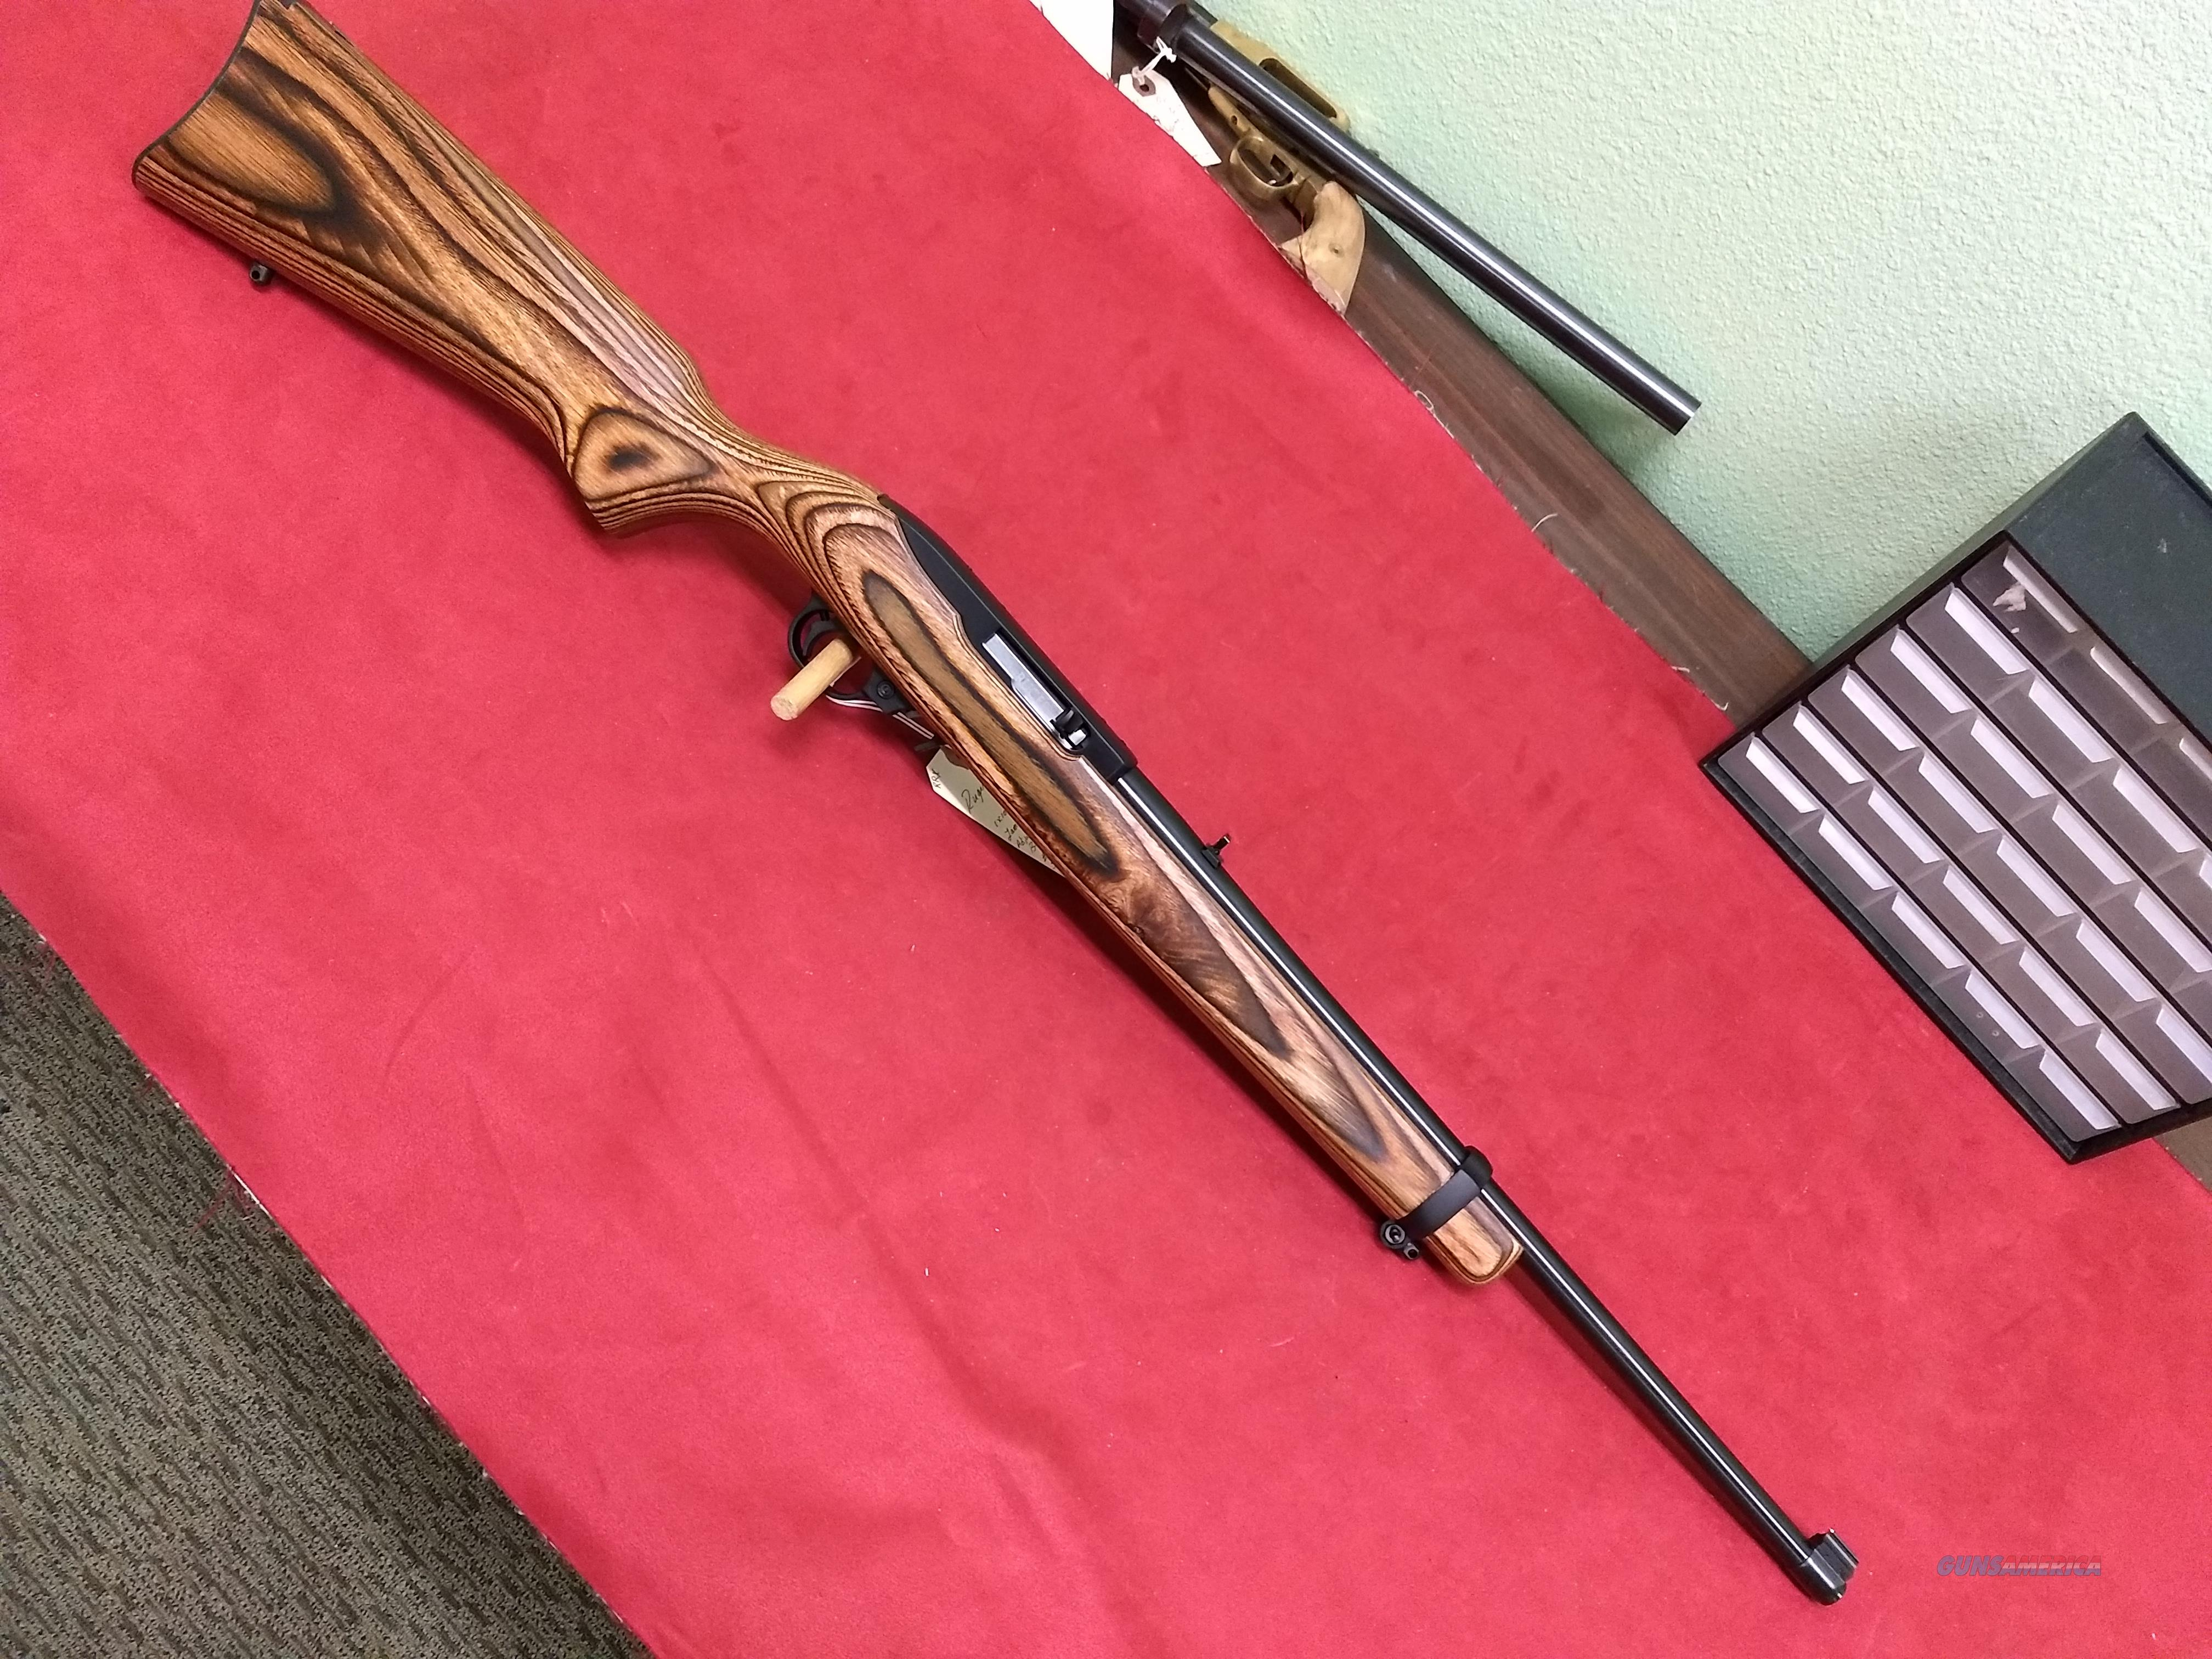 Ruger 10/22 Brown Laminate & Blued  Guns > Rifles > Ruger Rifles > 10-22